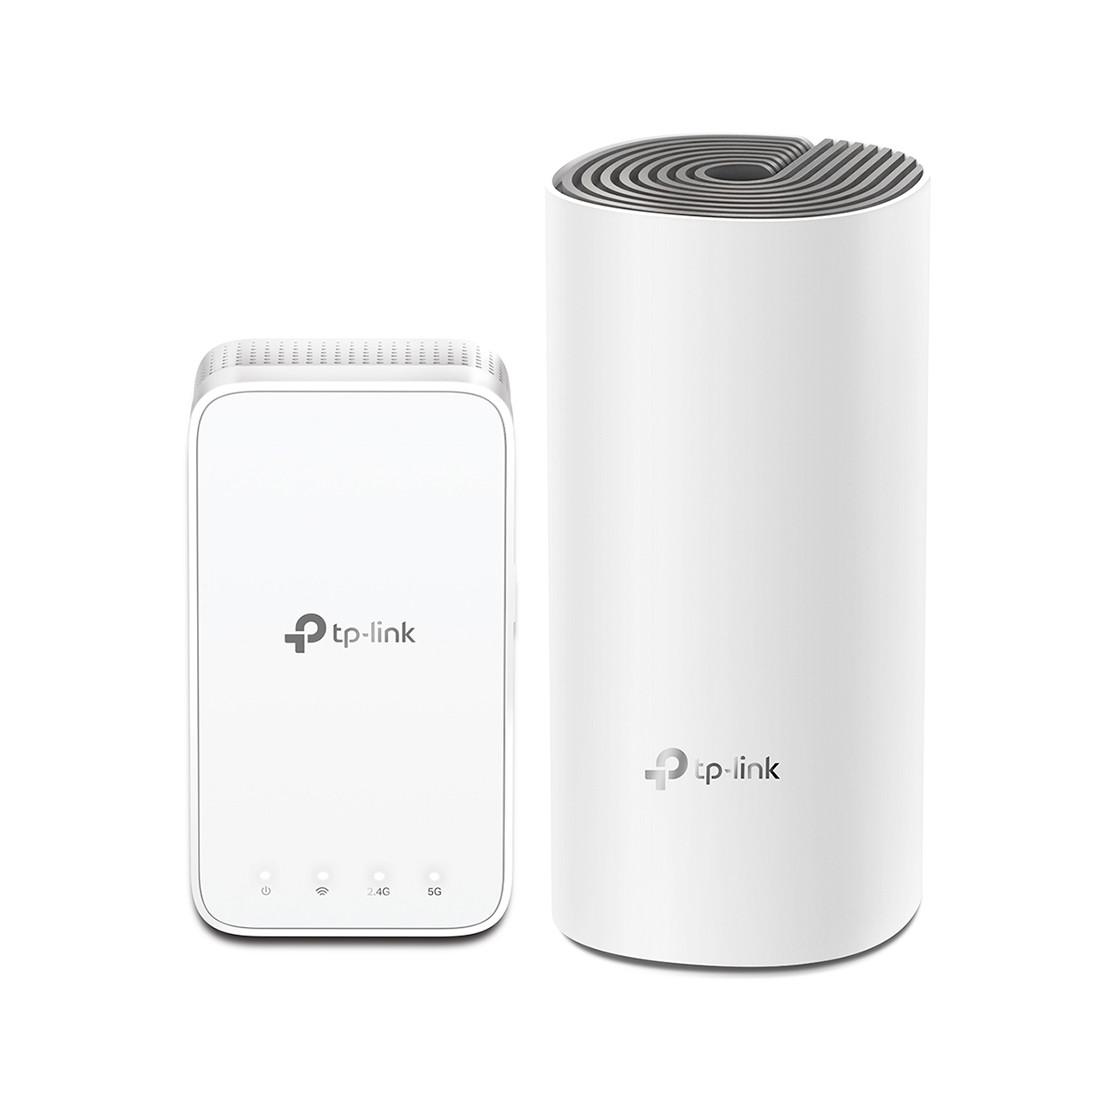 Домашняя Mesh Wi-Fi система AC1200 Tp-Link Deco E3 (2 устройства)